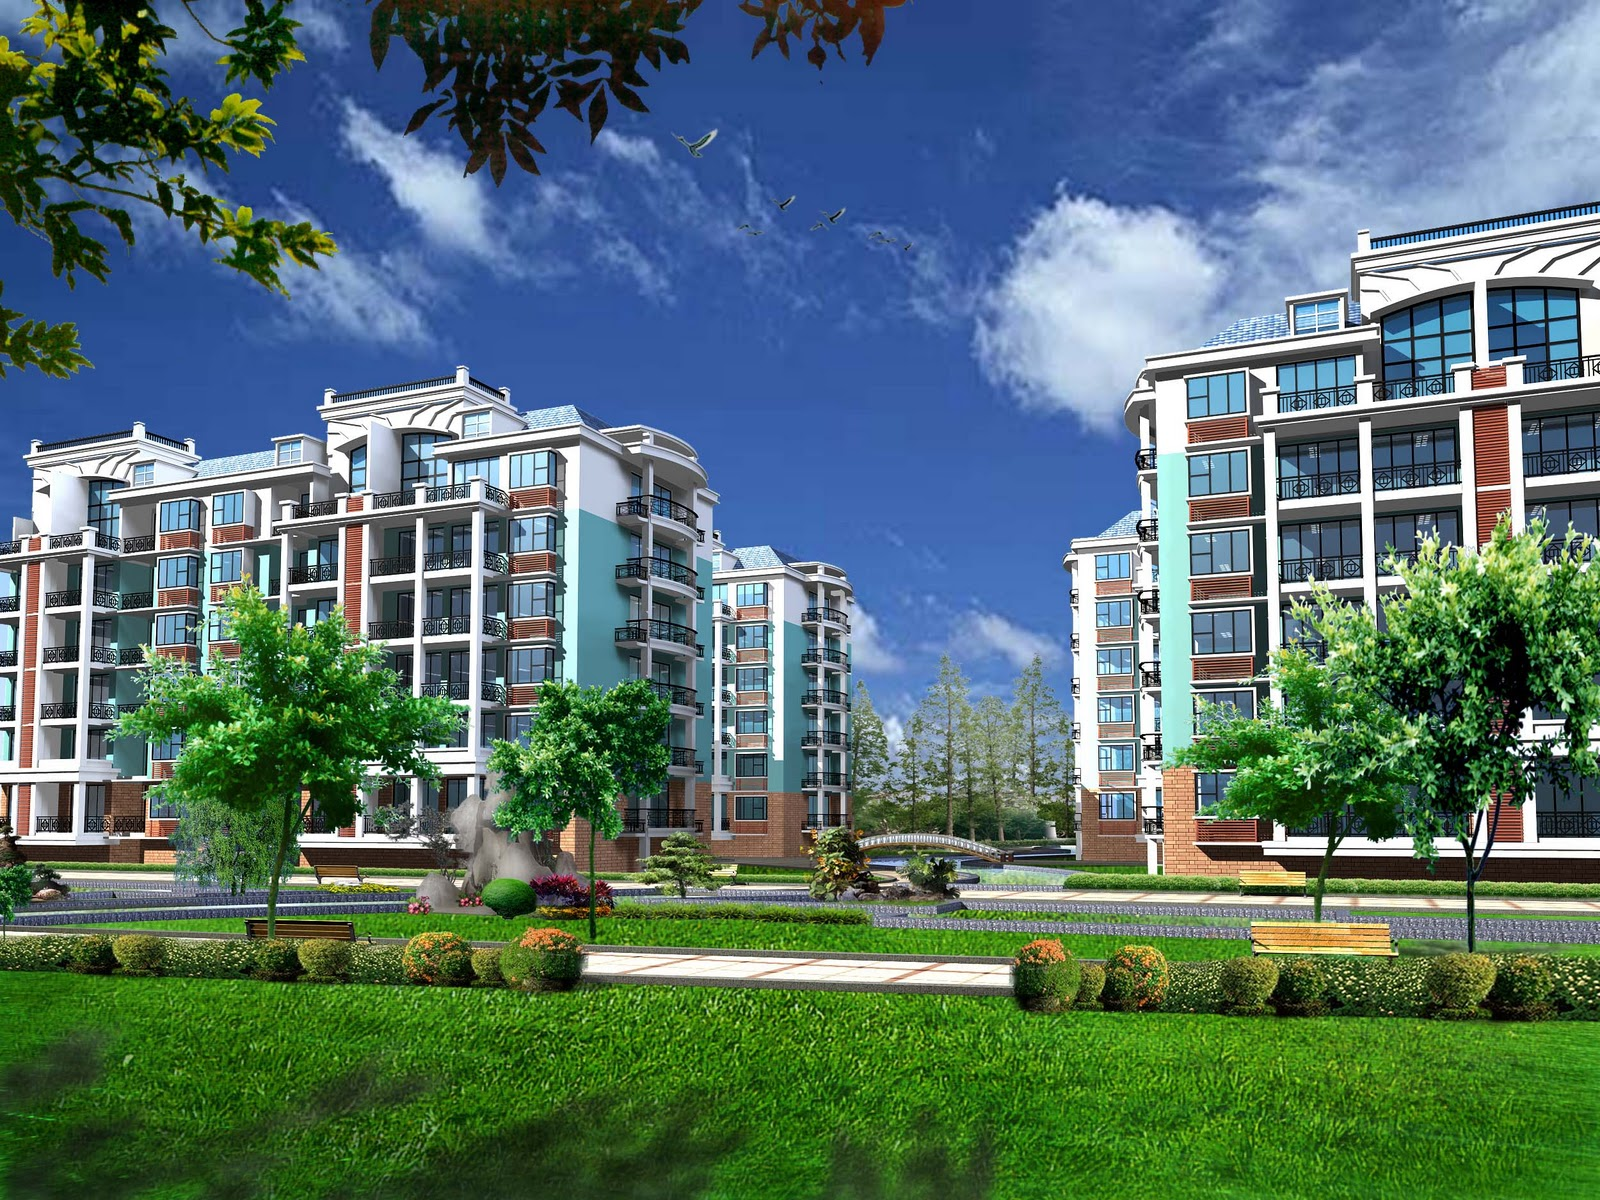 architectural%20scene%2005.jpg